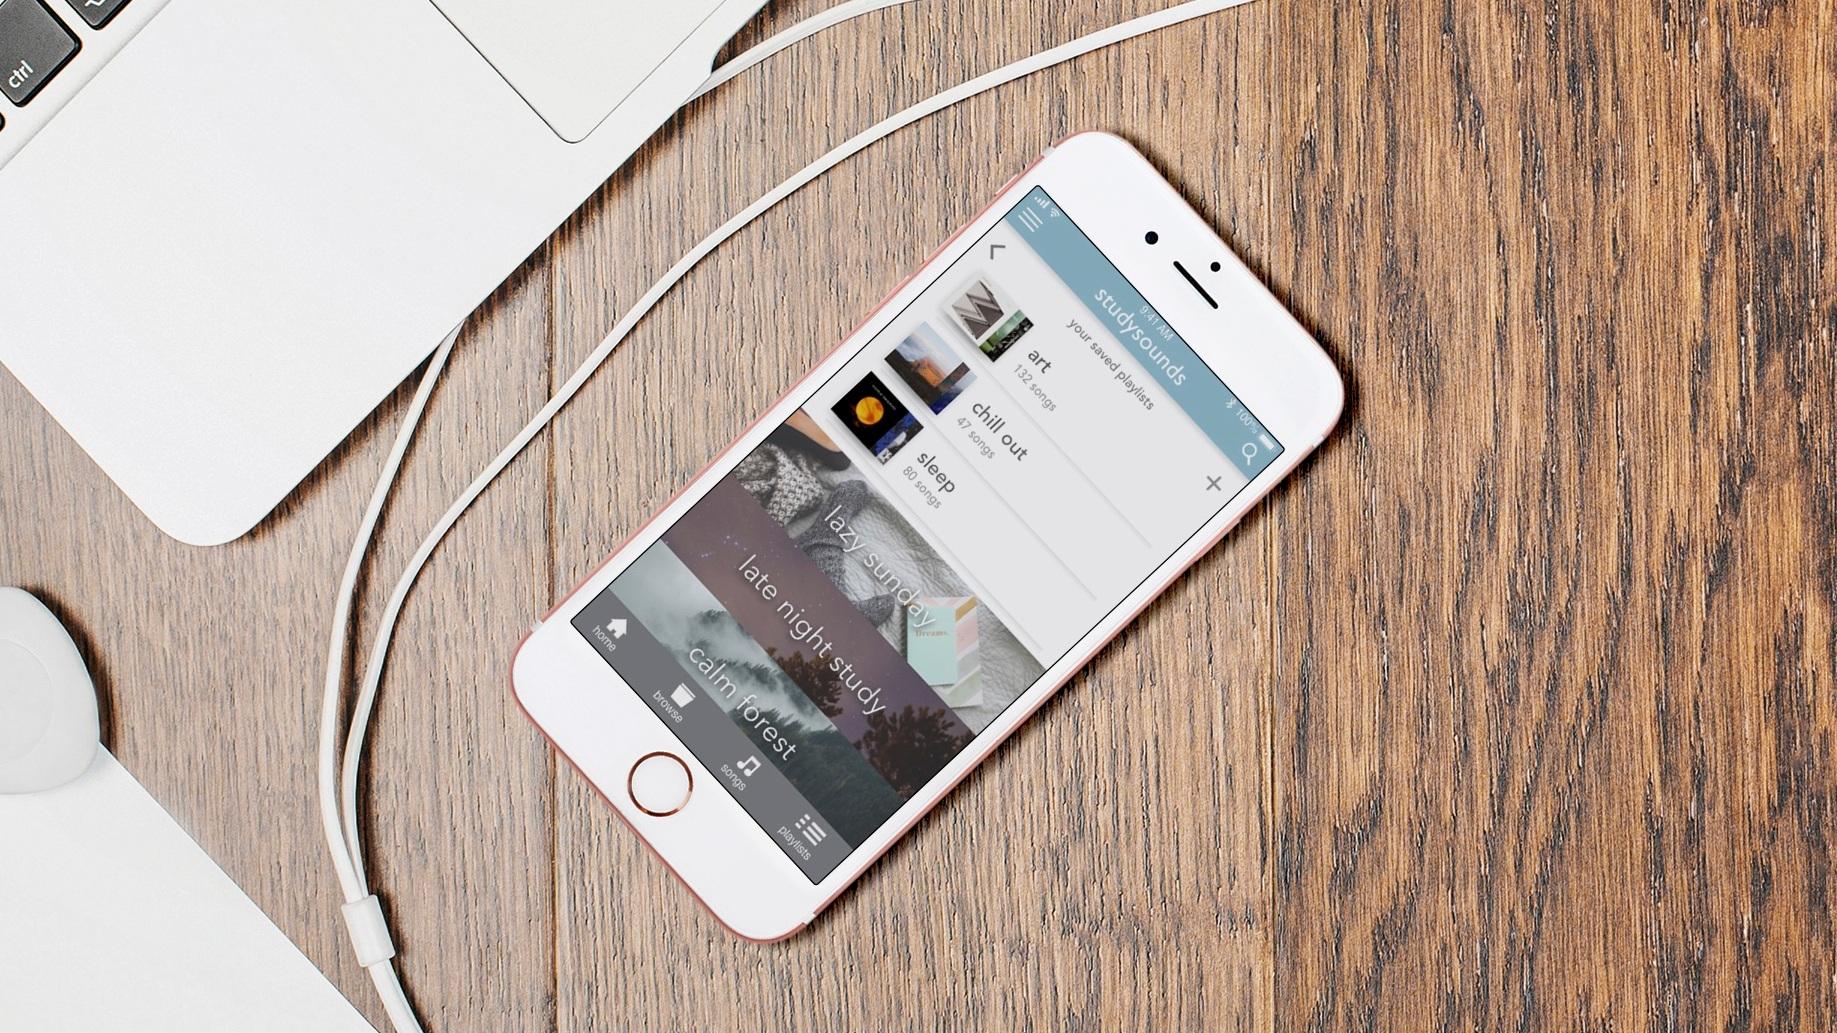 Free+iPhone+7+With+Wooden+Desktop+%26+Headphones+Mockup+2018-1.jpg